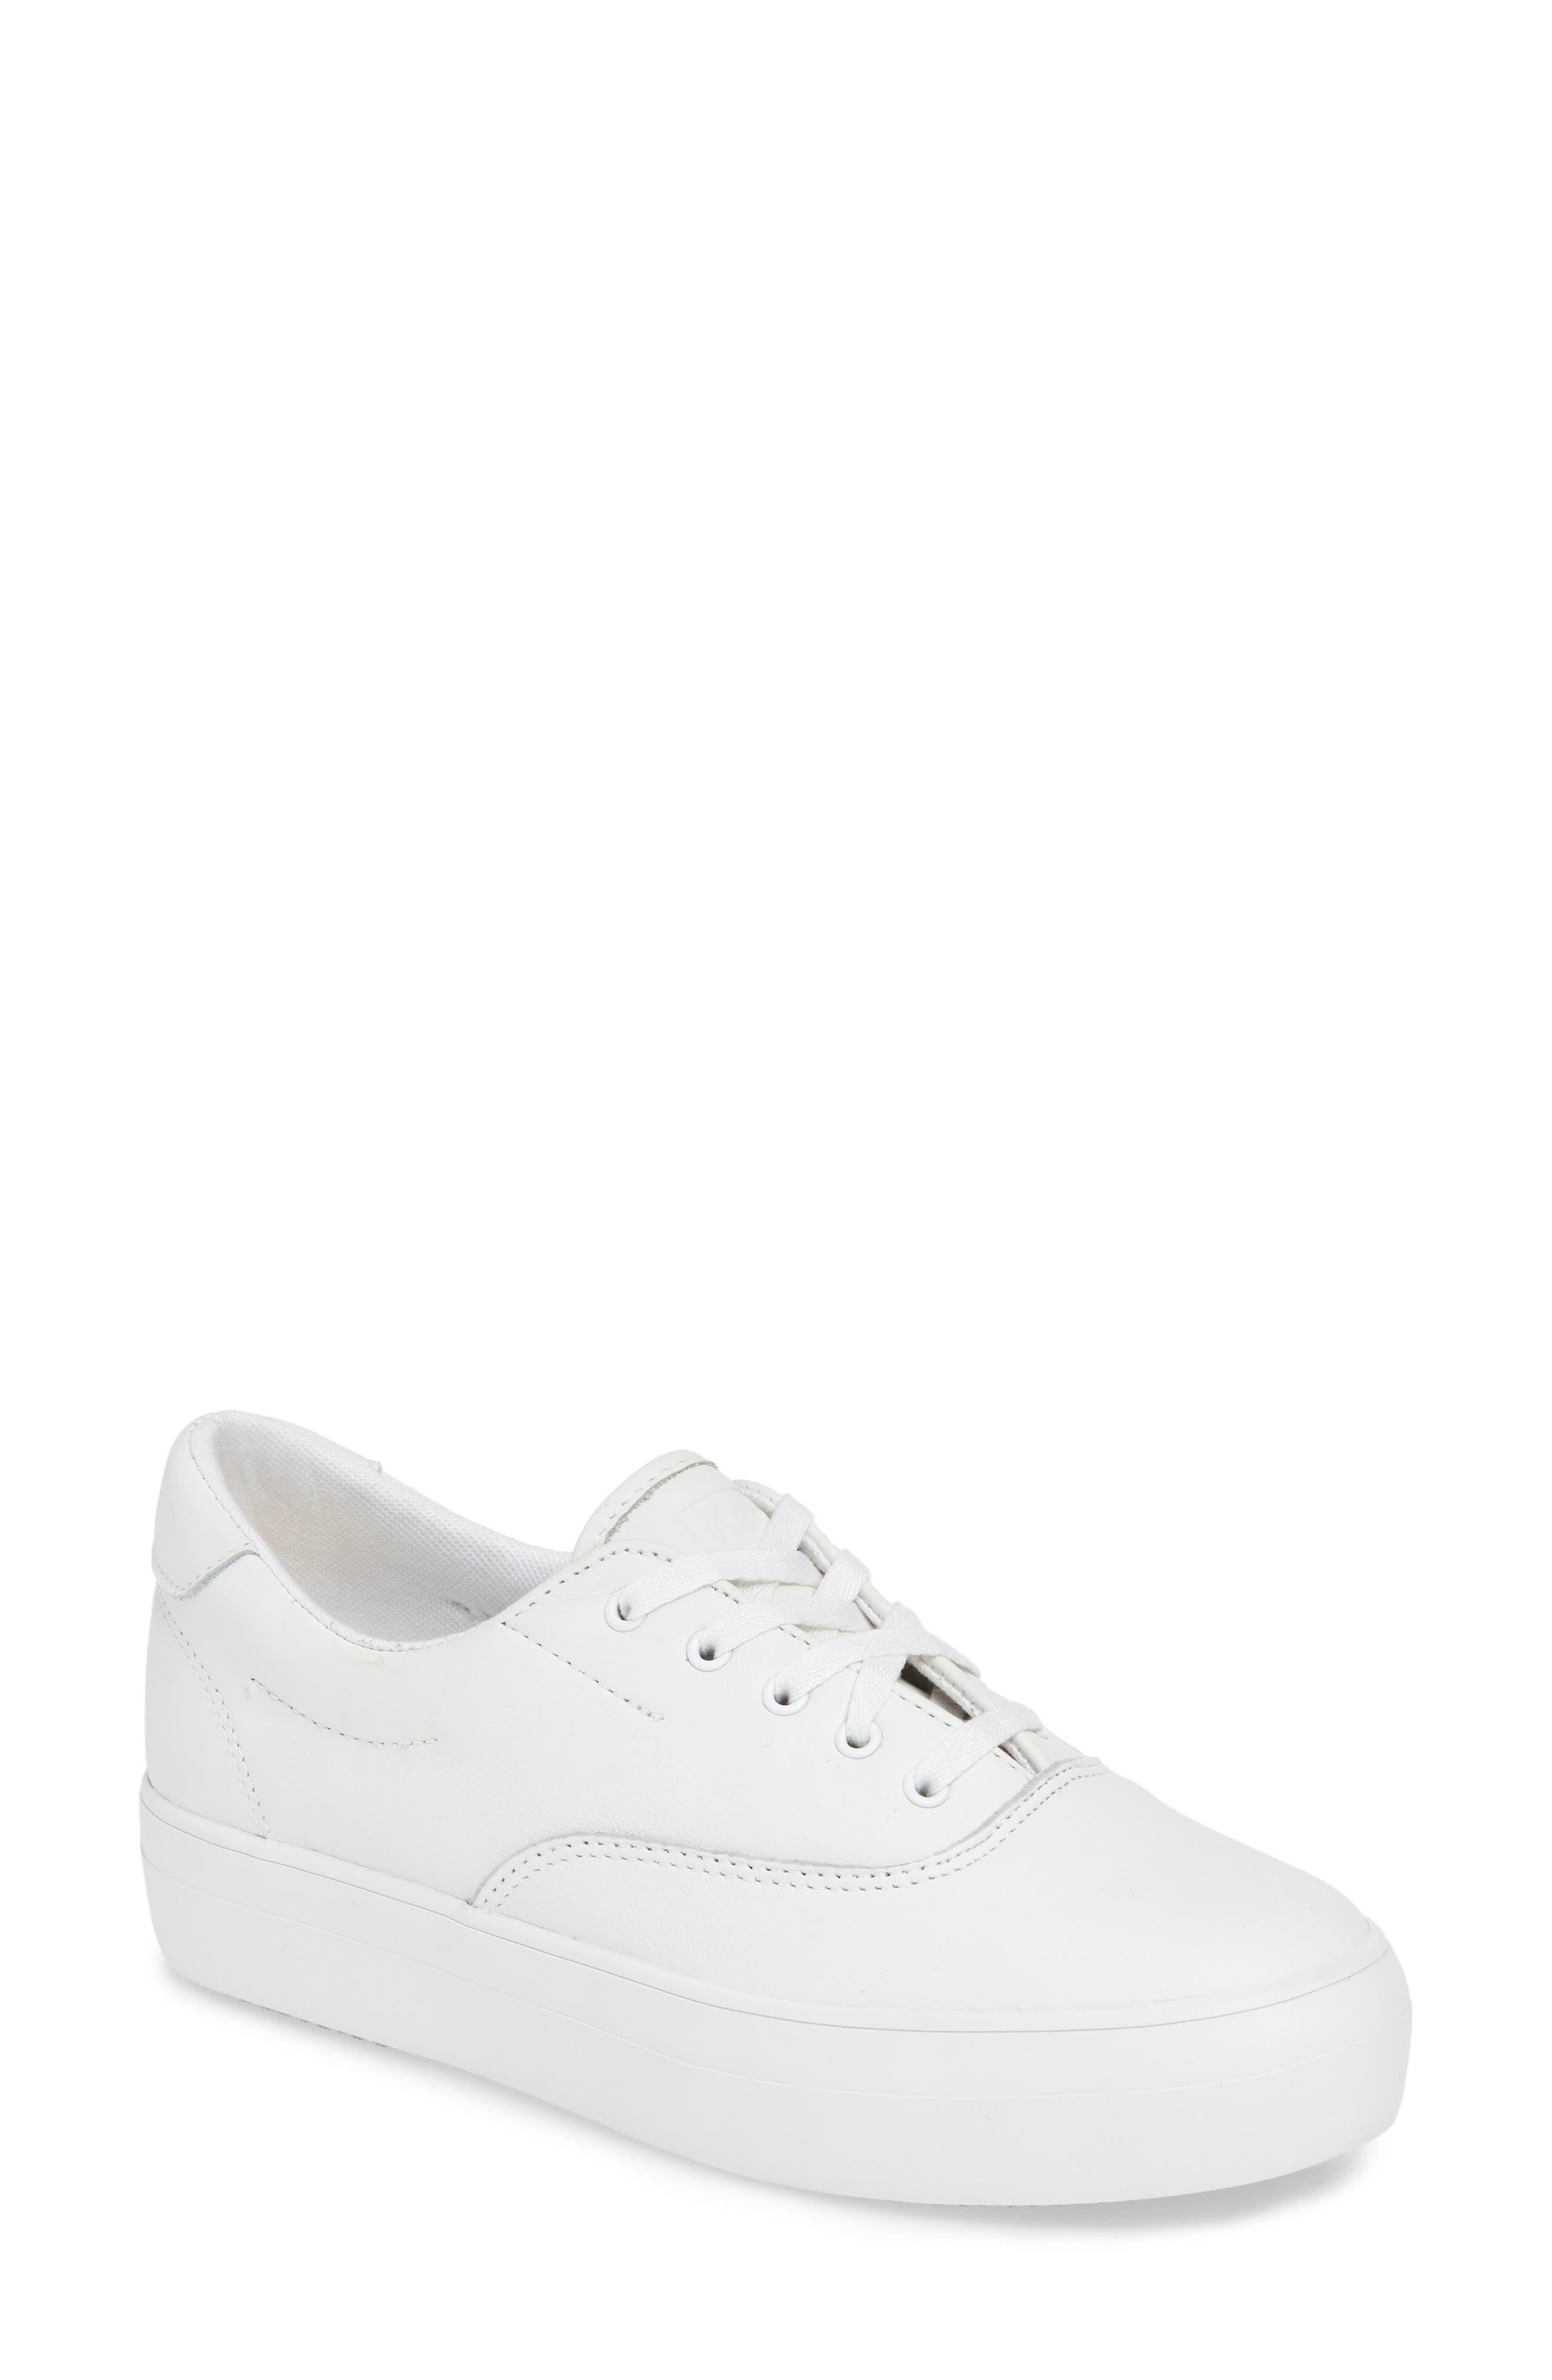 Women's Keds® Shoes | Nordstrom